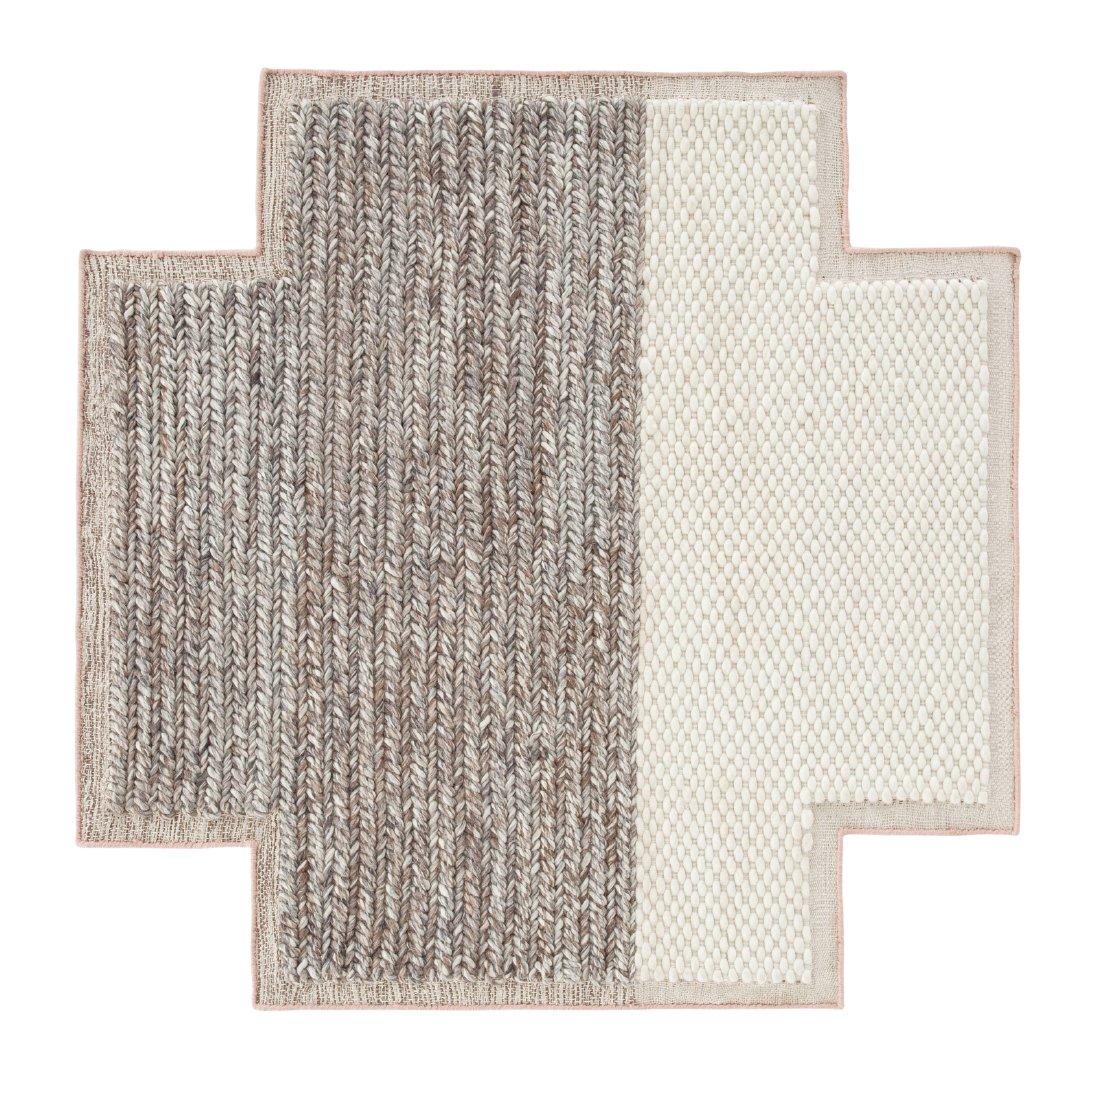 Square Rhombus Mangas Space Ivory S - Gan Rugs